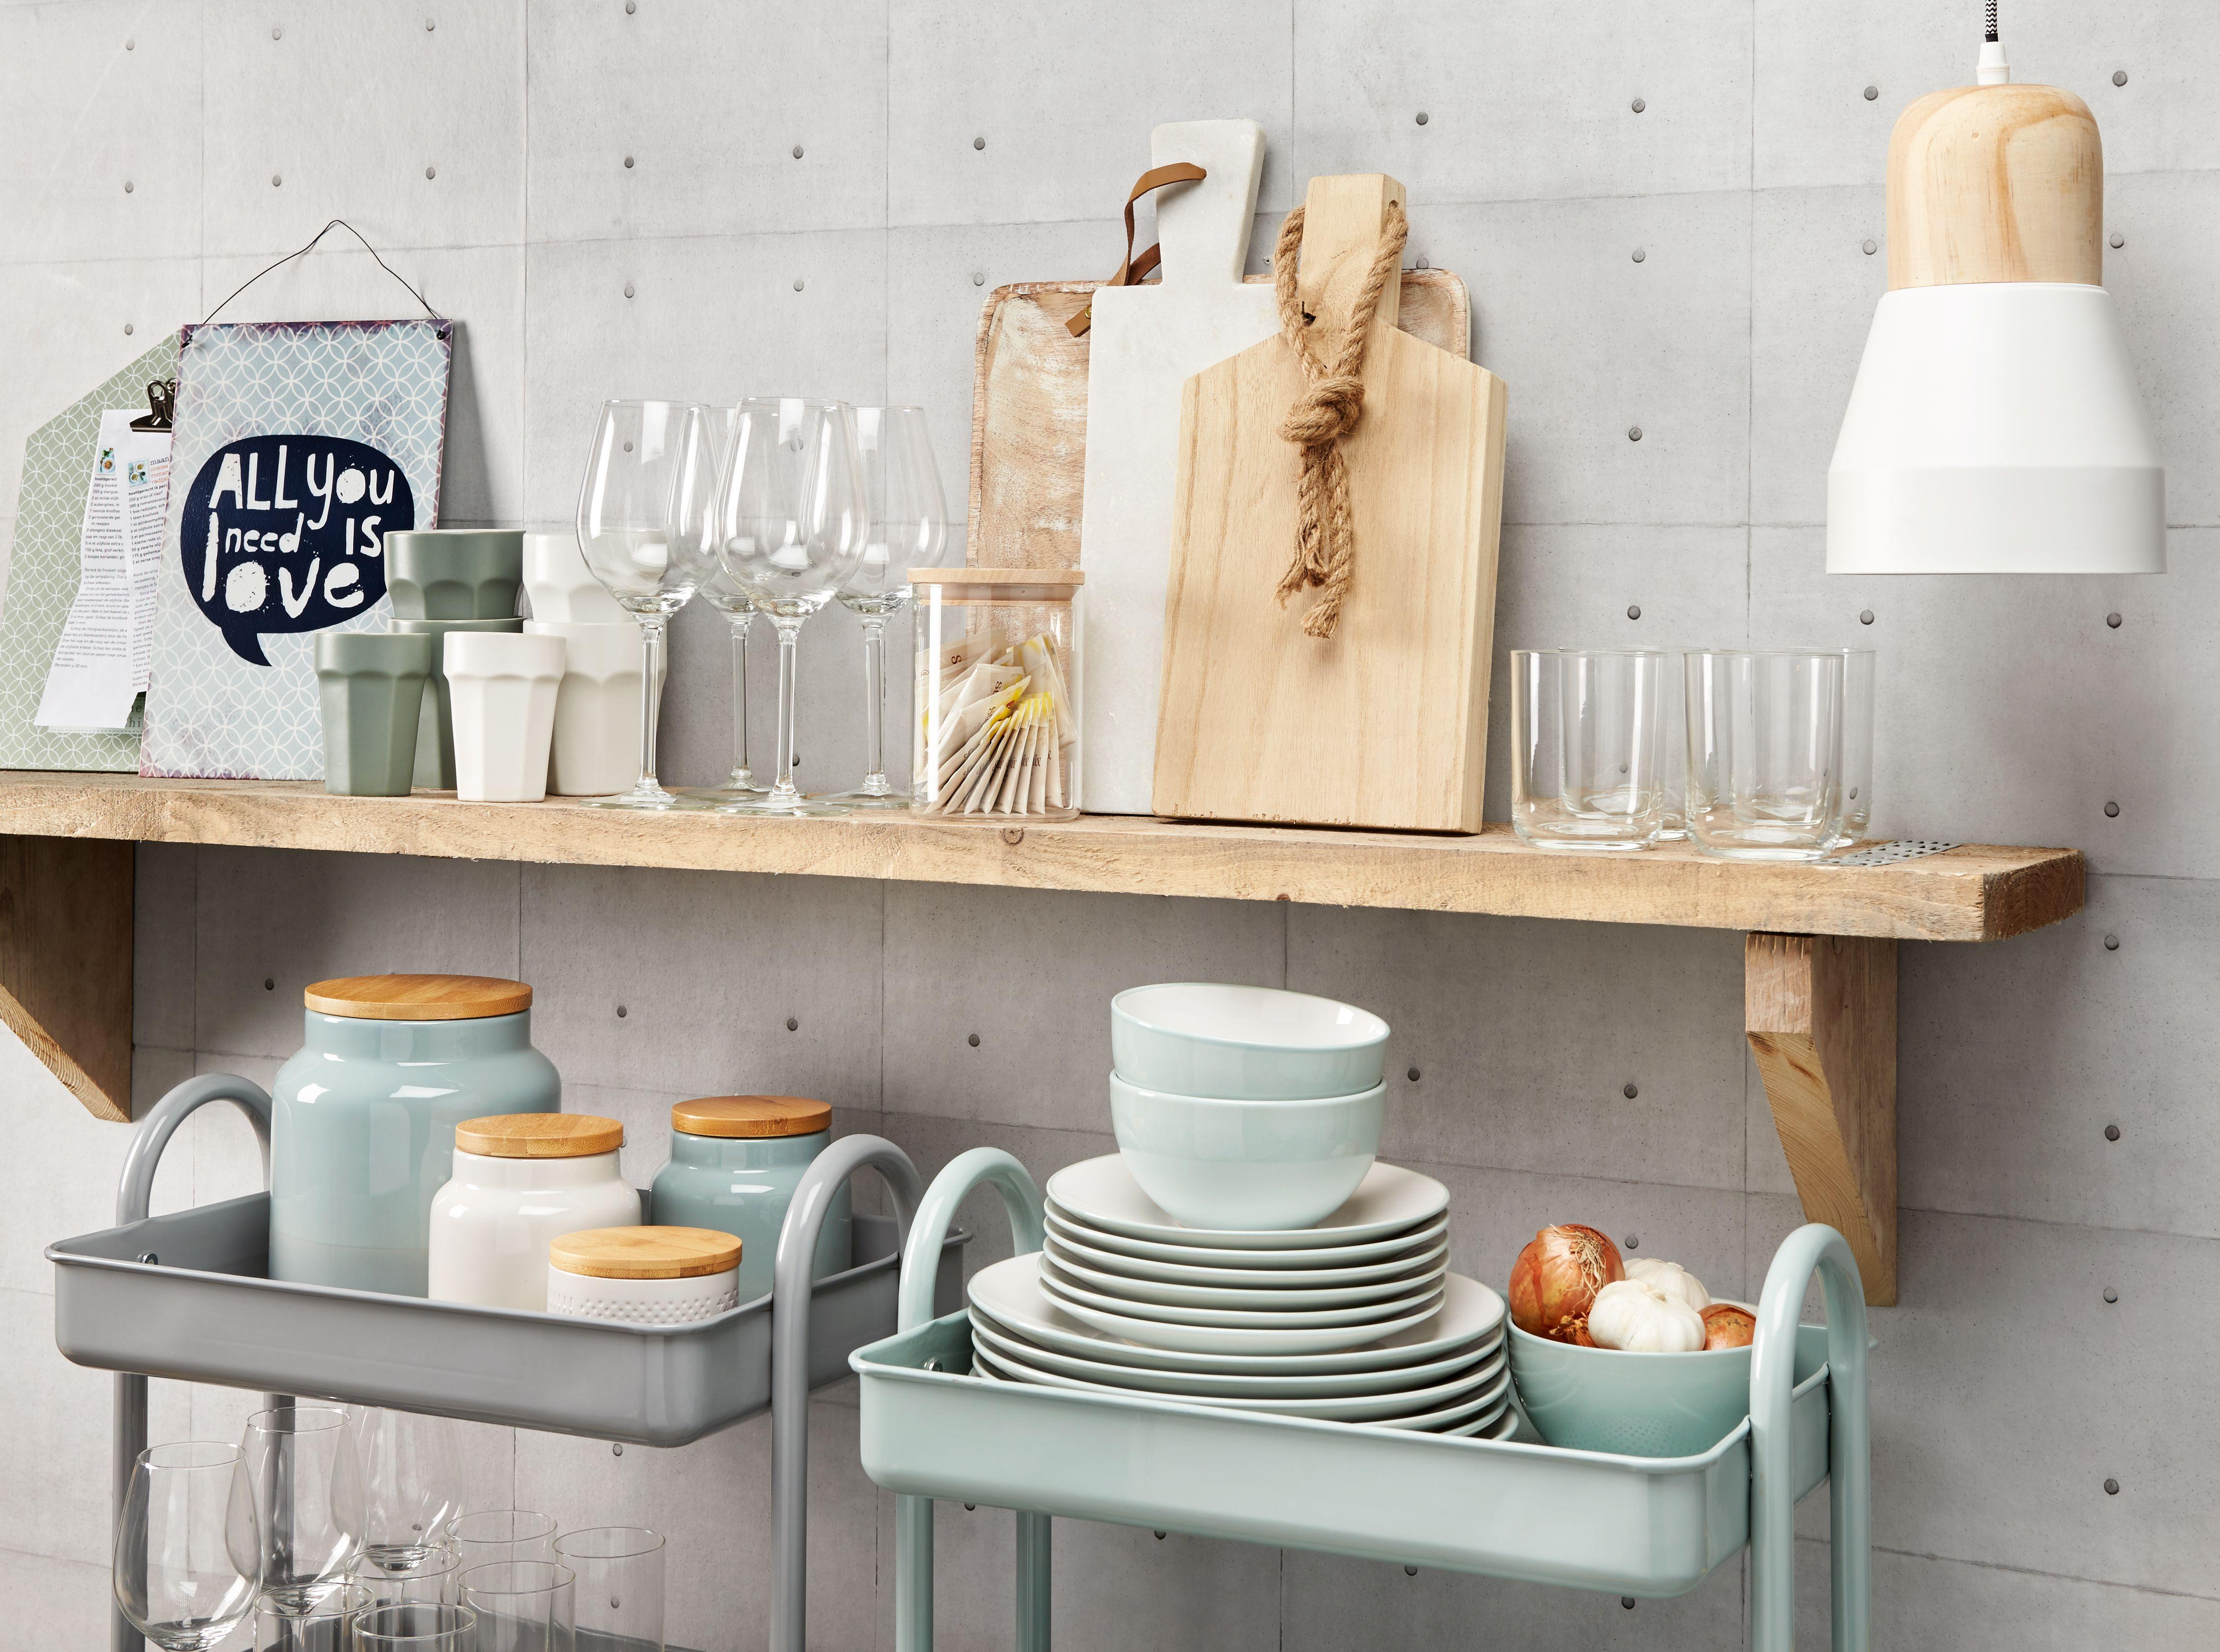 Pastelkleurig tafelgerei voor een mooie gedekte tafel kwantum keuken eetkamer pastel - Decoratie tafel eetkamer ...